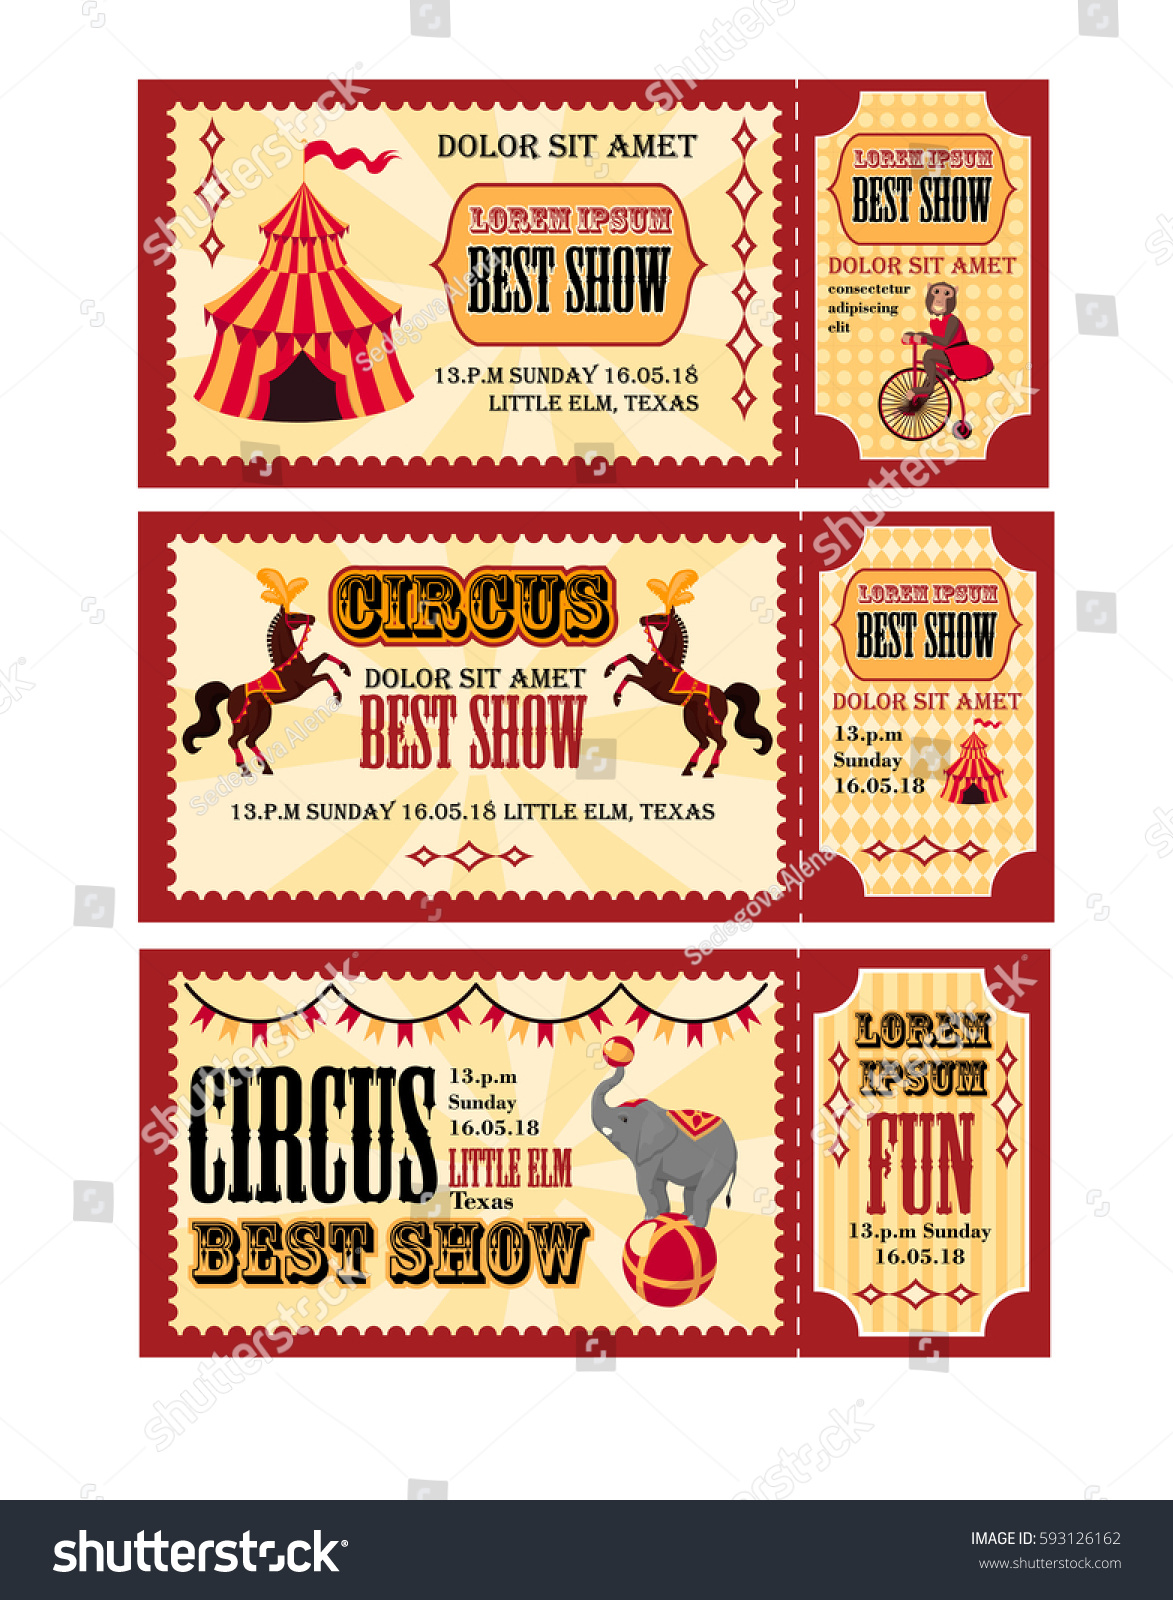 Circus Tickets Design Tent Circus Horses Stock-Vektorgrafik ...